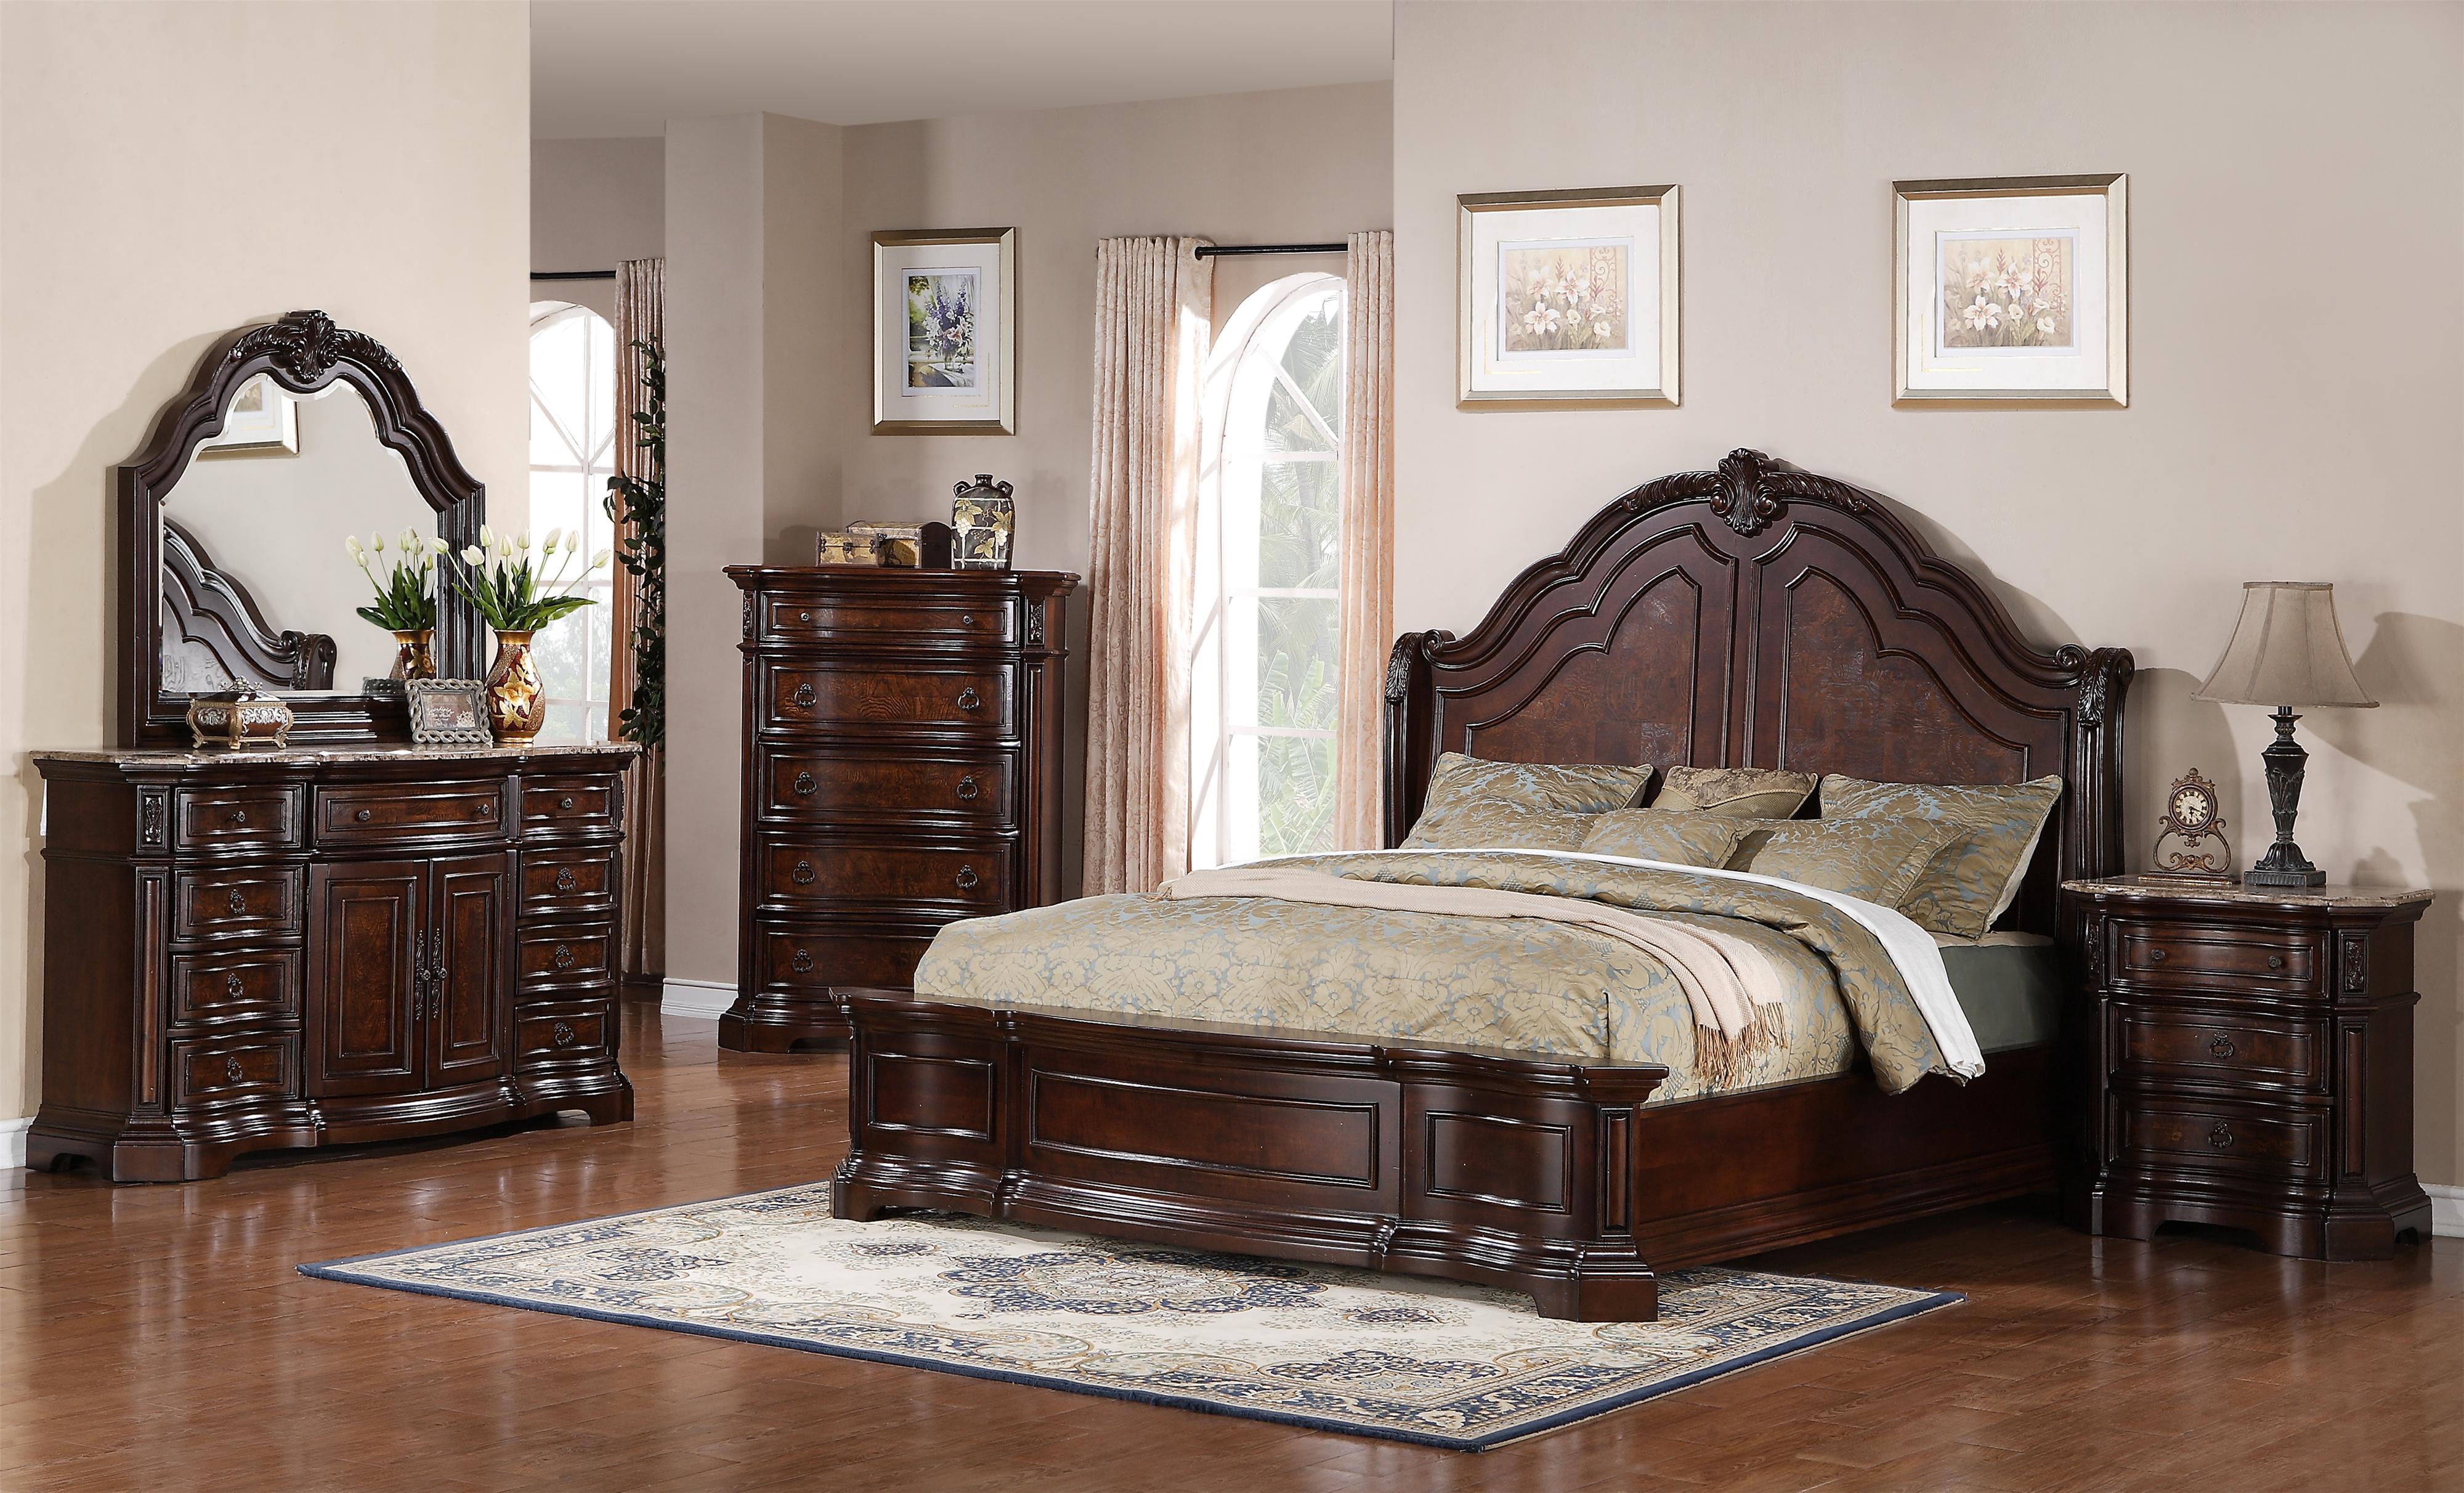 Samuel Lawrence Edington California King Bedroom Group - Item Number: 8328 CK Bedroom Group 2